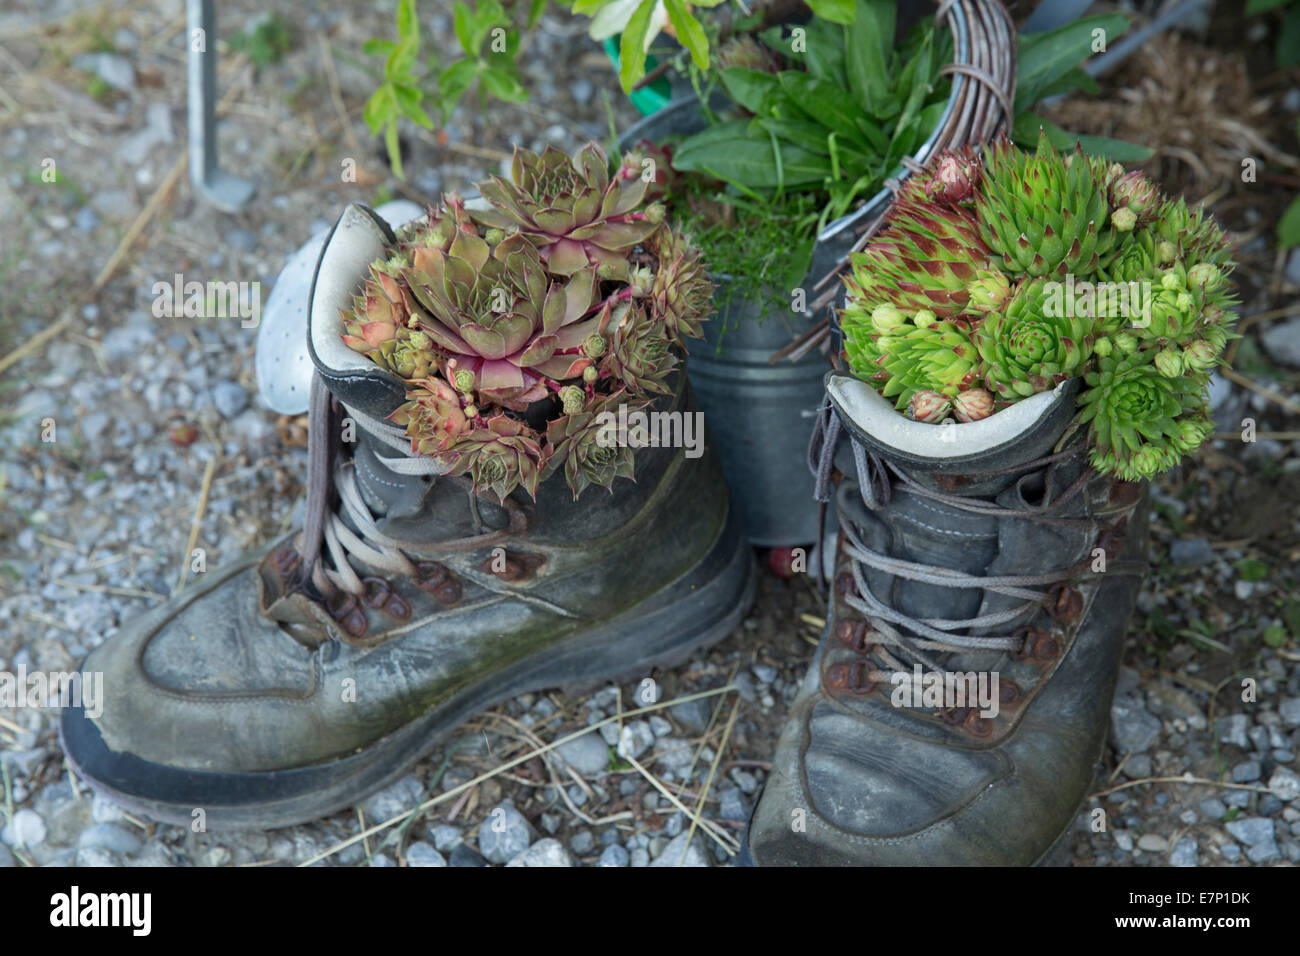 Shoes, traveling shoes, footpath, walking, hiking, flower, flowers, Switzerland, Europe, - Stock Image